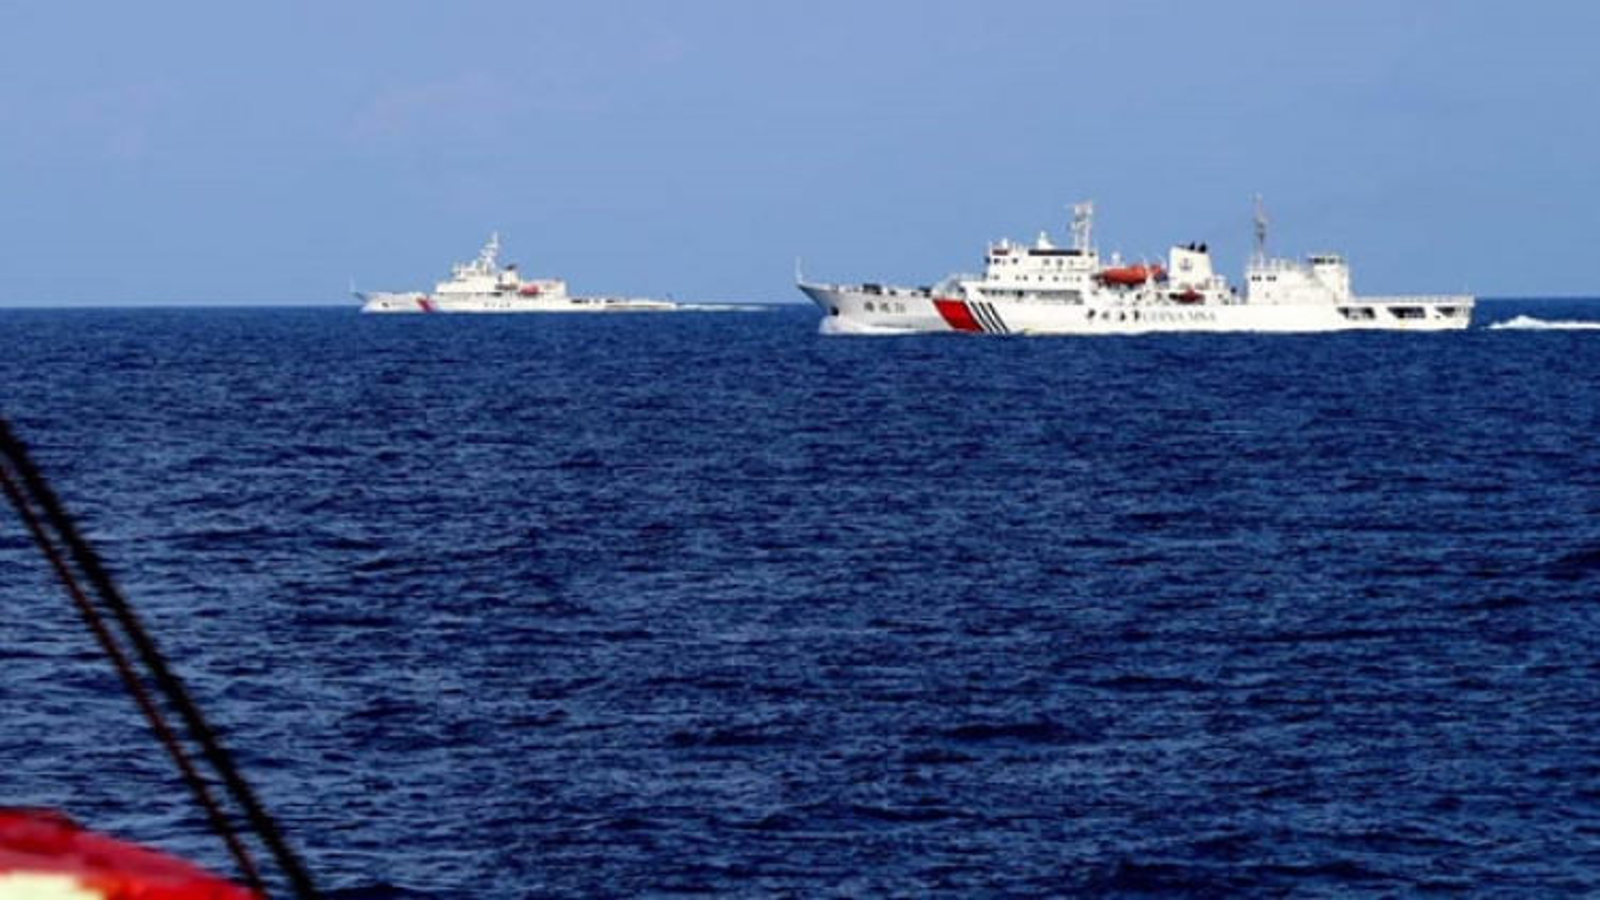 Foreign scholars: China violates UNCLOS